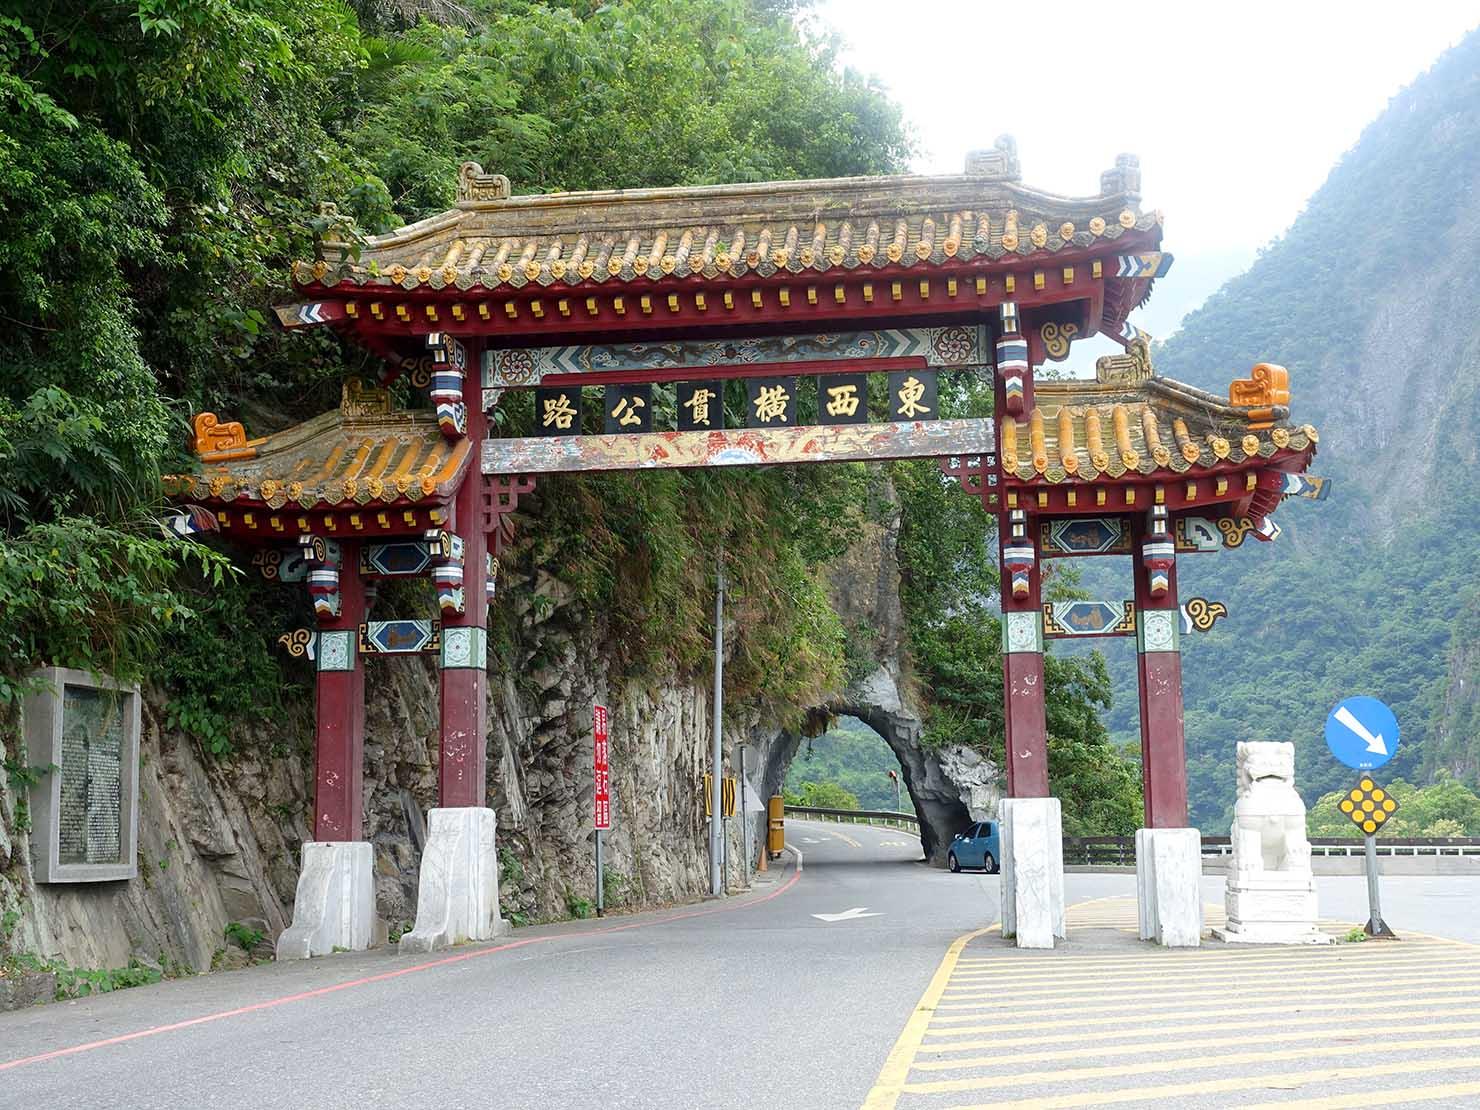 KKday外国人限定「花蓮・太魯閣(タロコ)日帰りツアー」太魯閣國家公園入り口